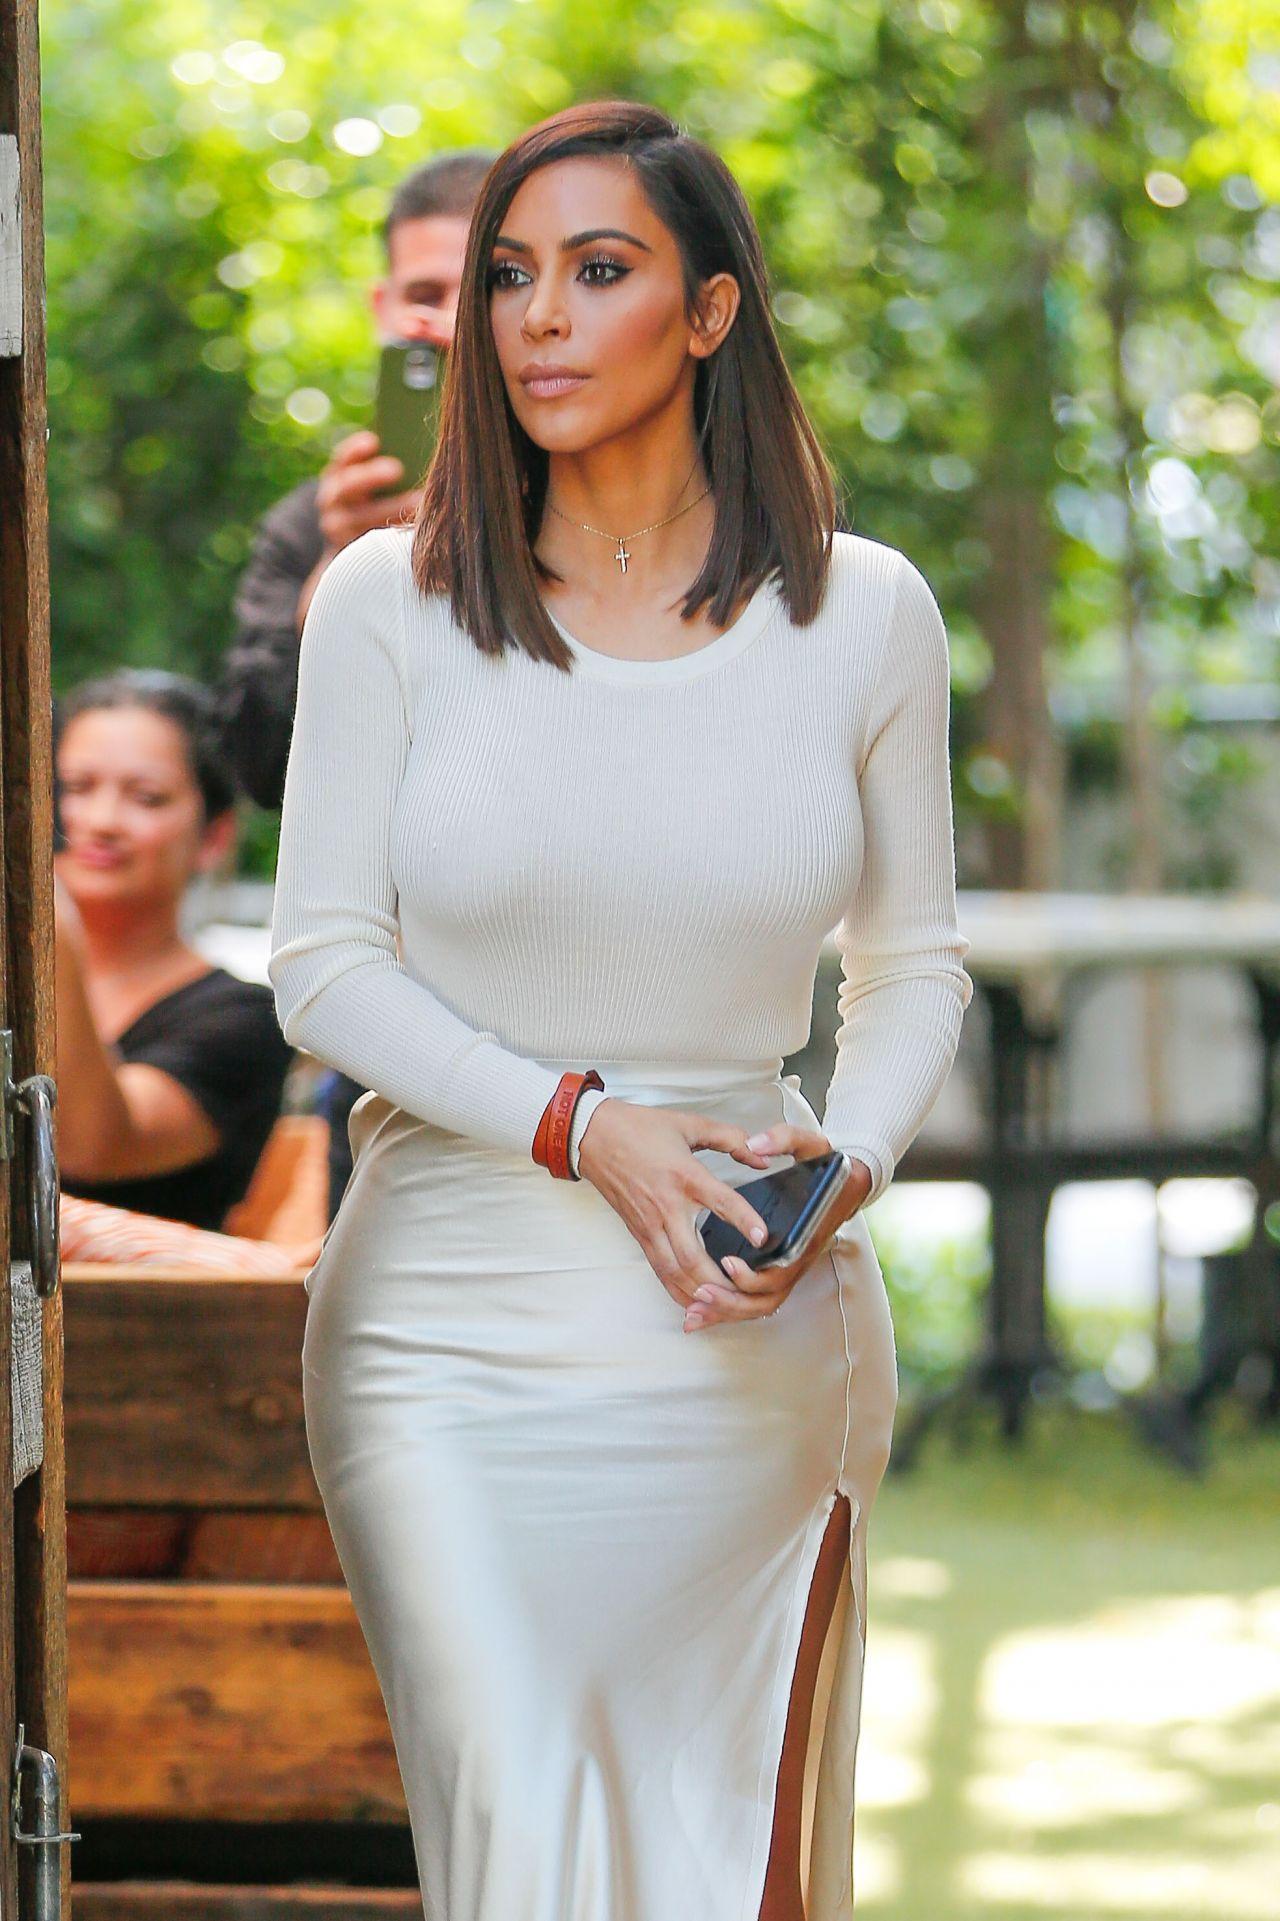 kim kardashian classy fashion  at the villa restaurant in